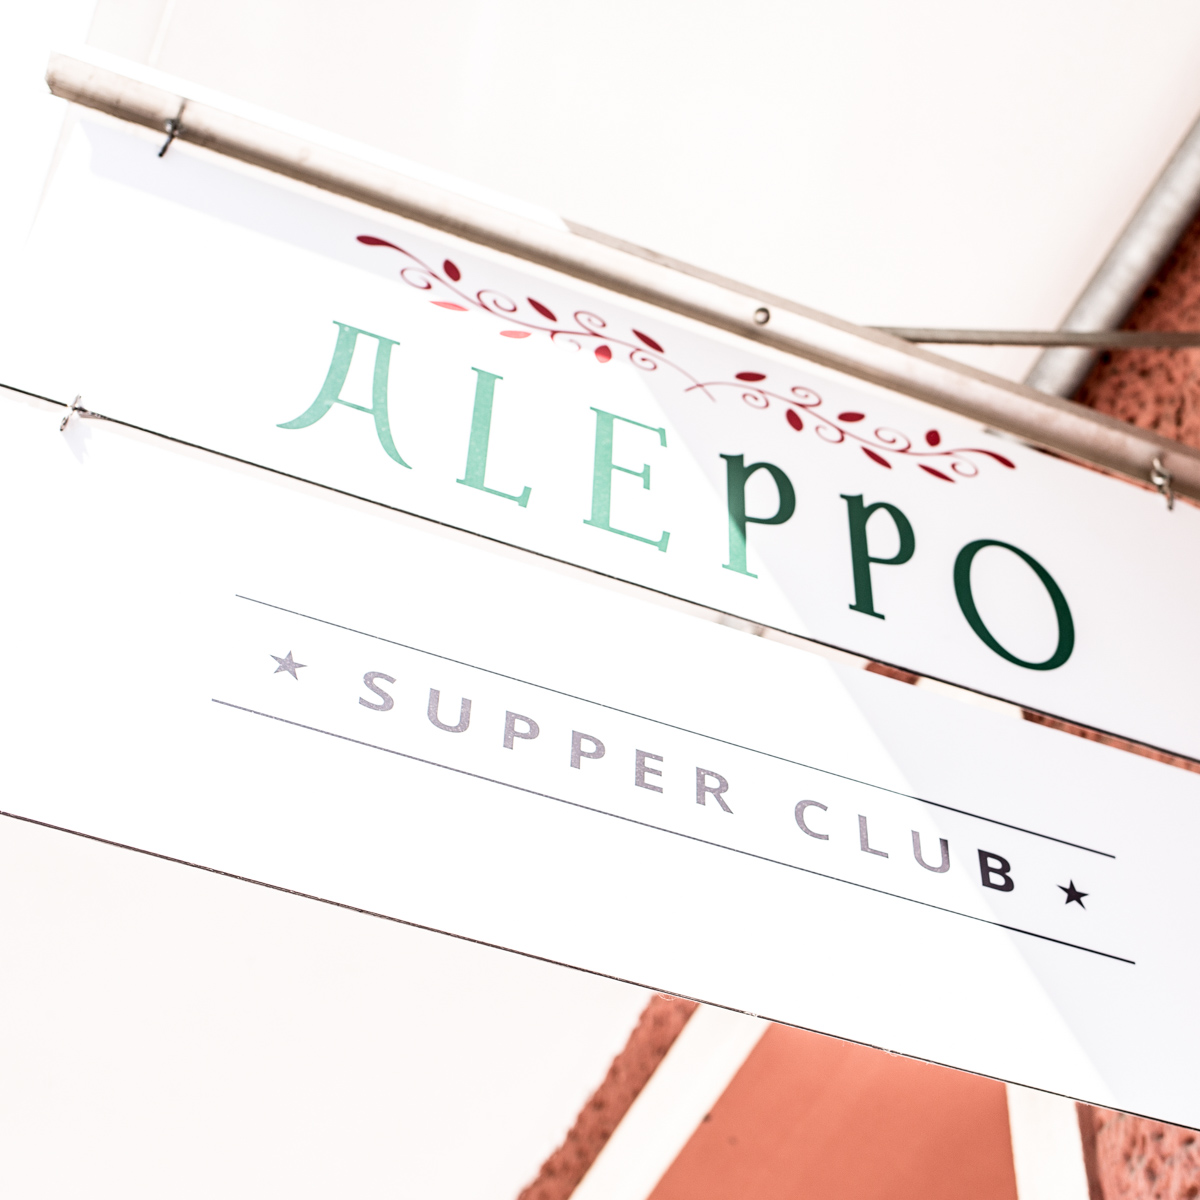 Aleppo Supper Club Berlin-4